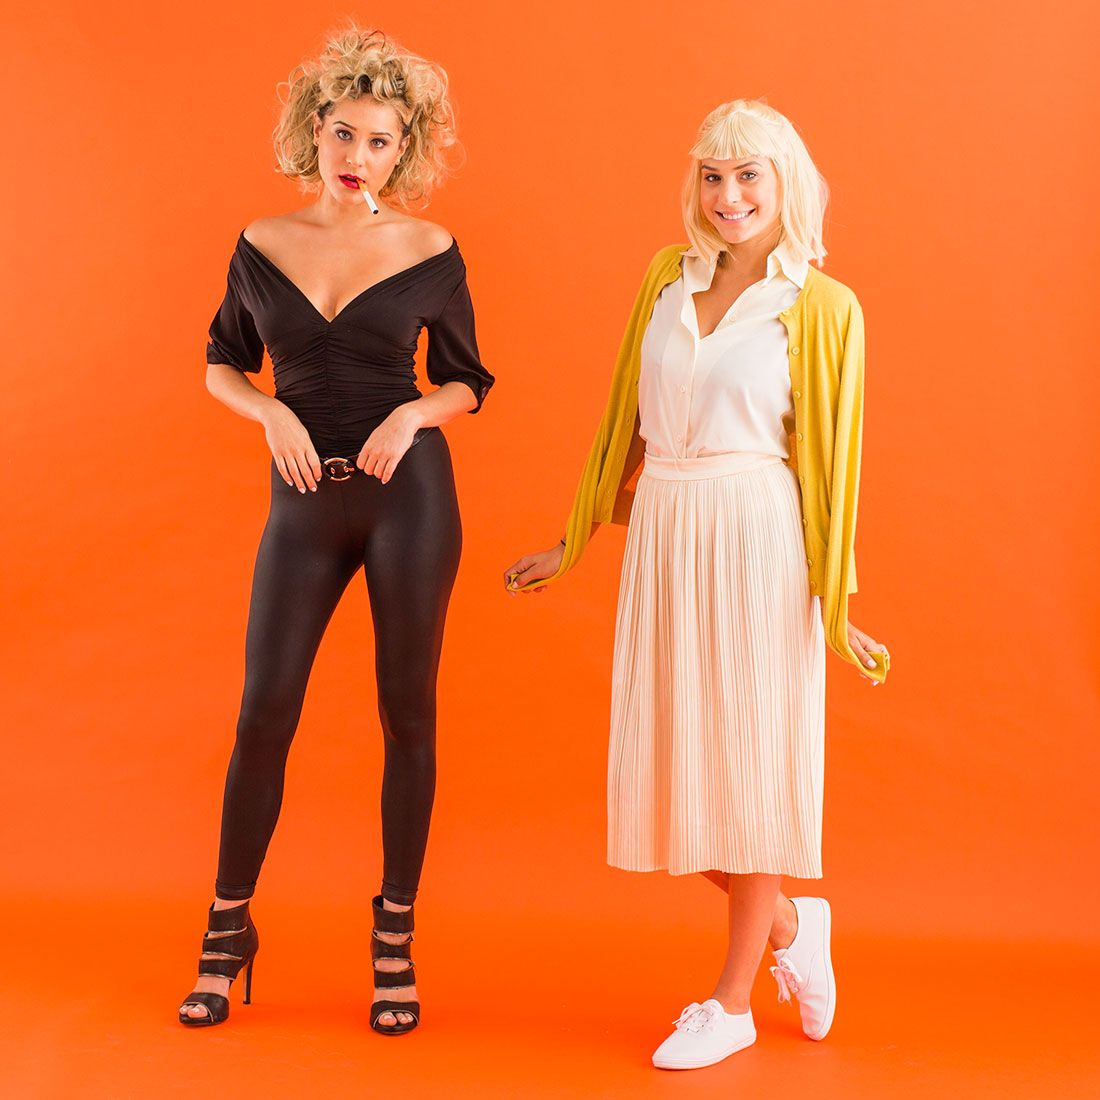 5 genius halloween costume ideas for twins - Greece Halloween Costumes